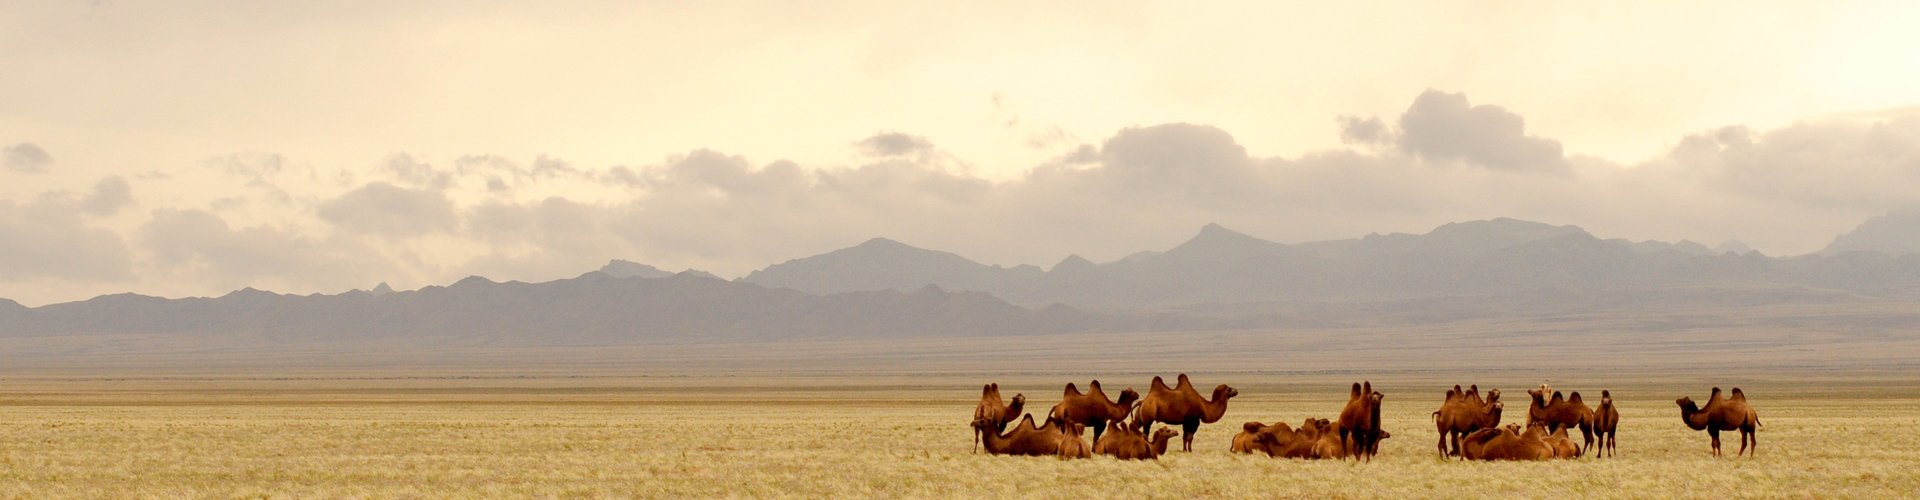 Gobi-woestijn in Mongolië